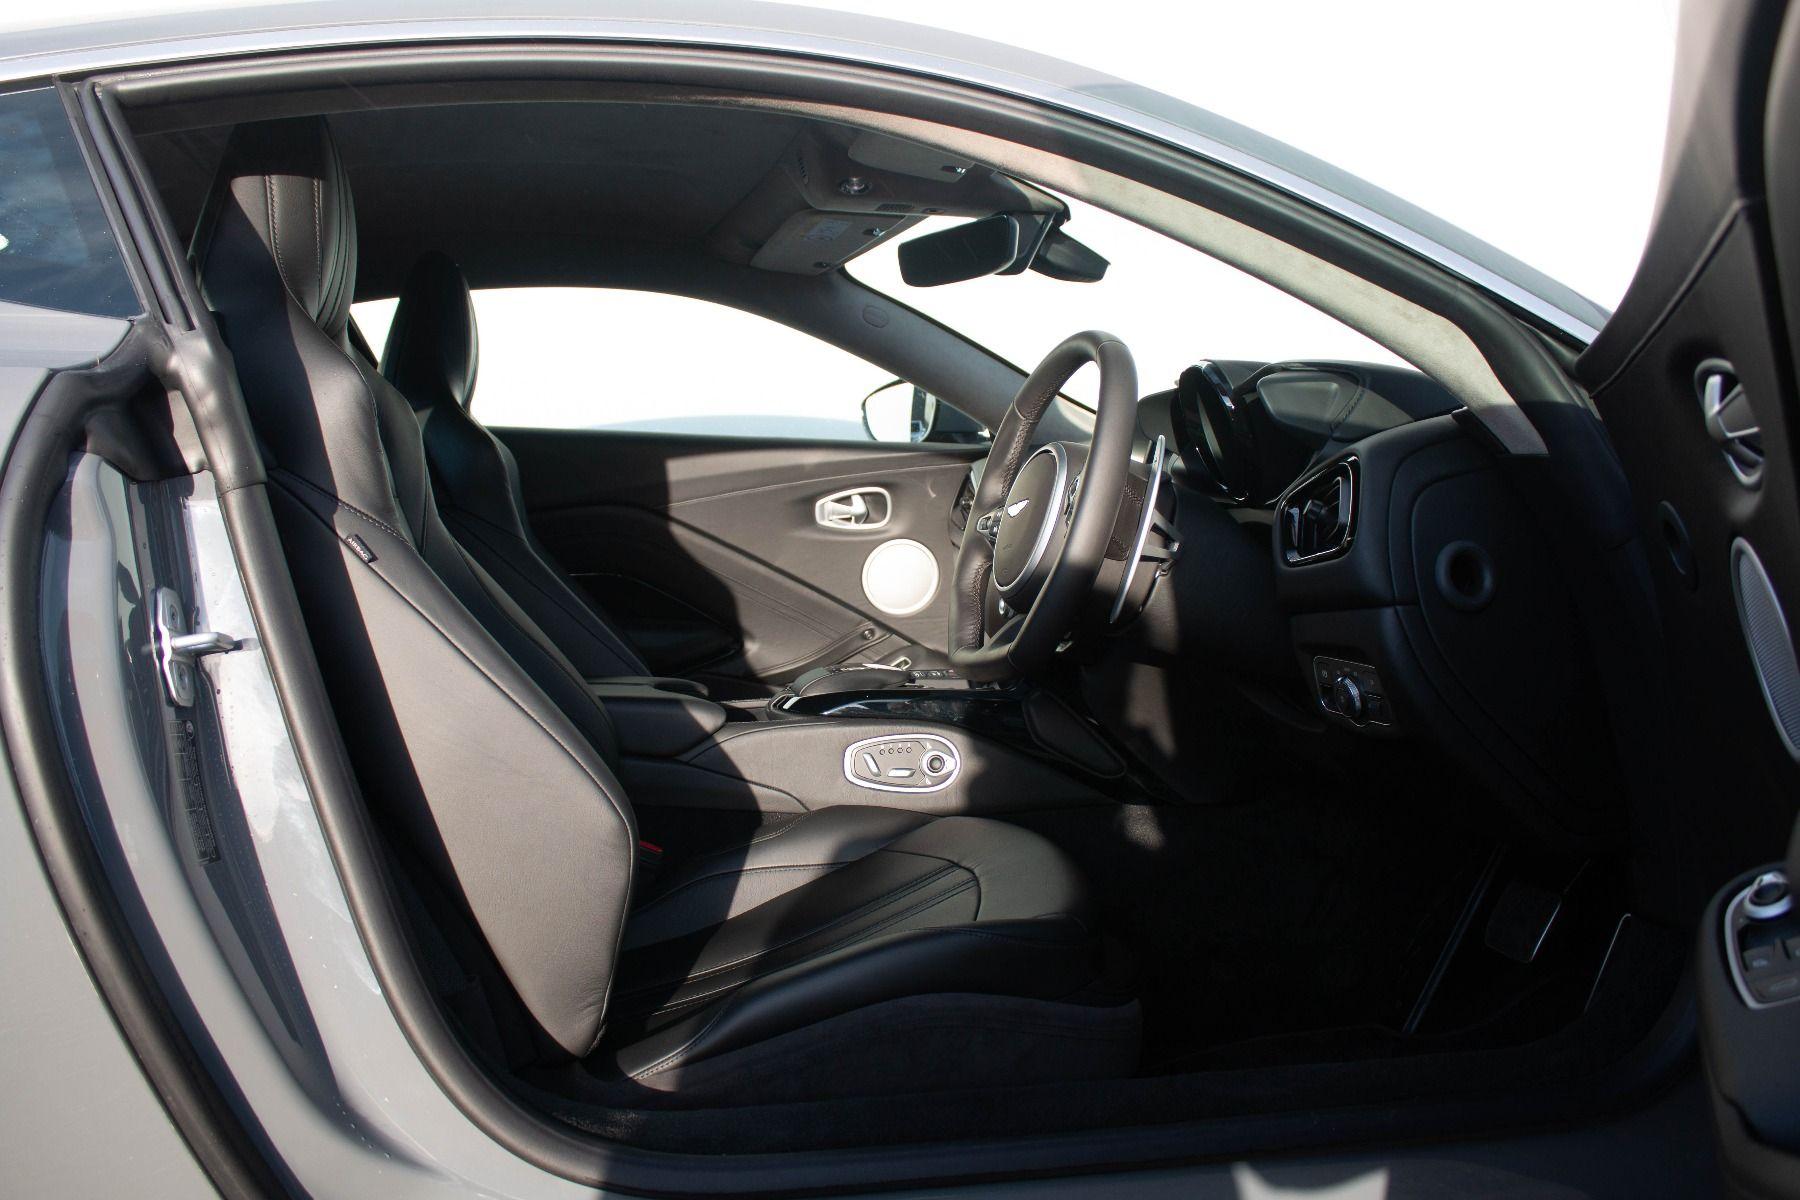 Aston Martin V8 Vantage Coupe 2dr ZF 8 Speed image 6